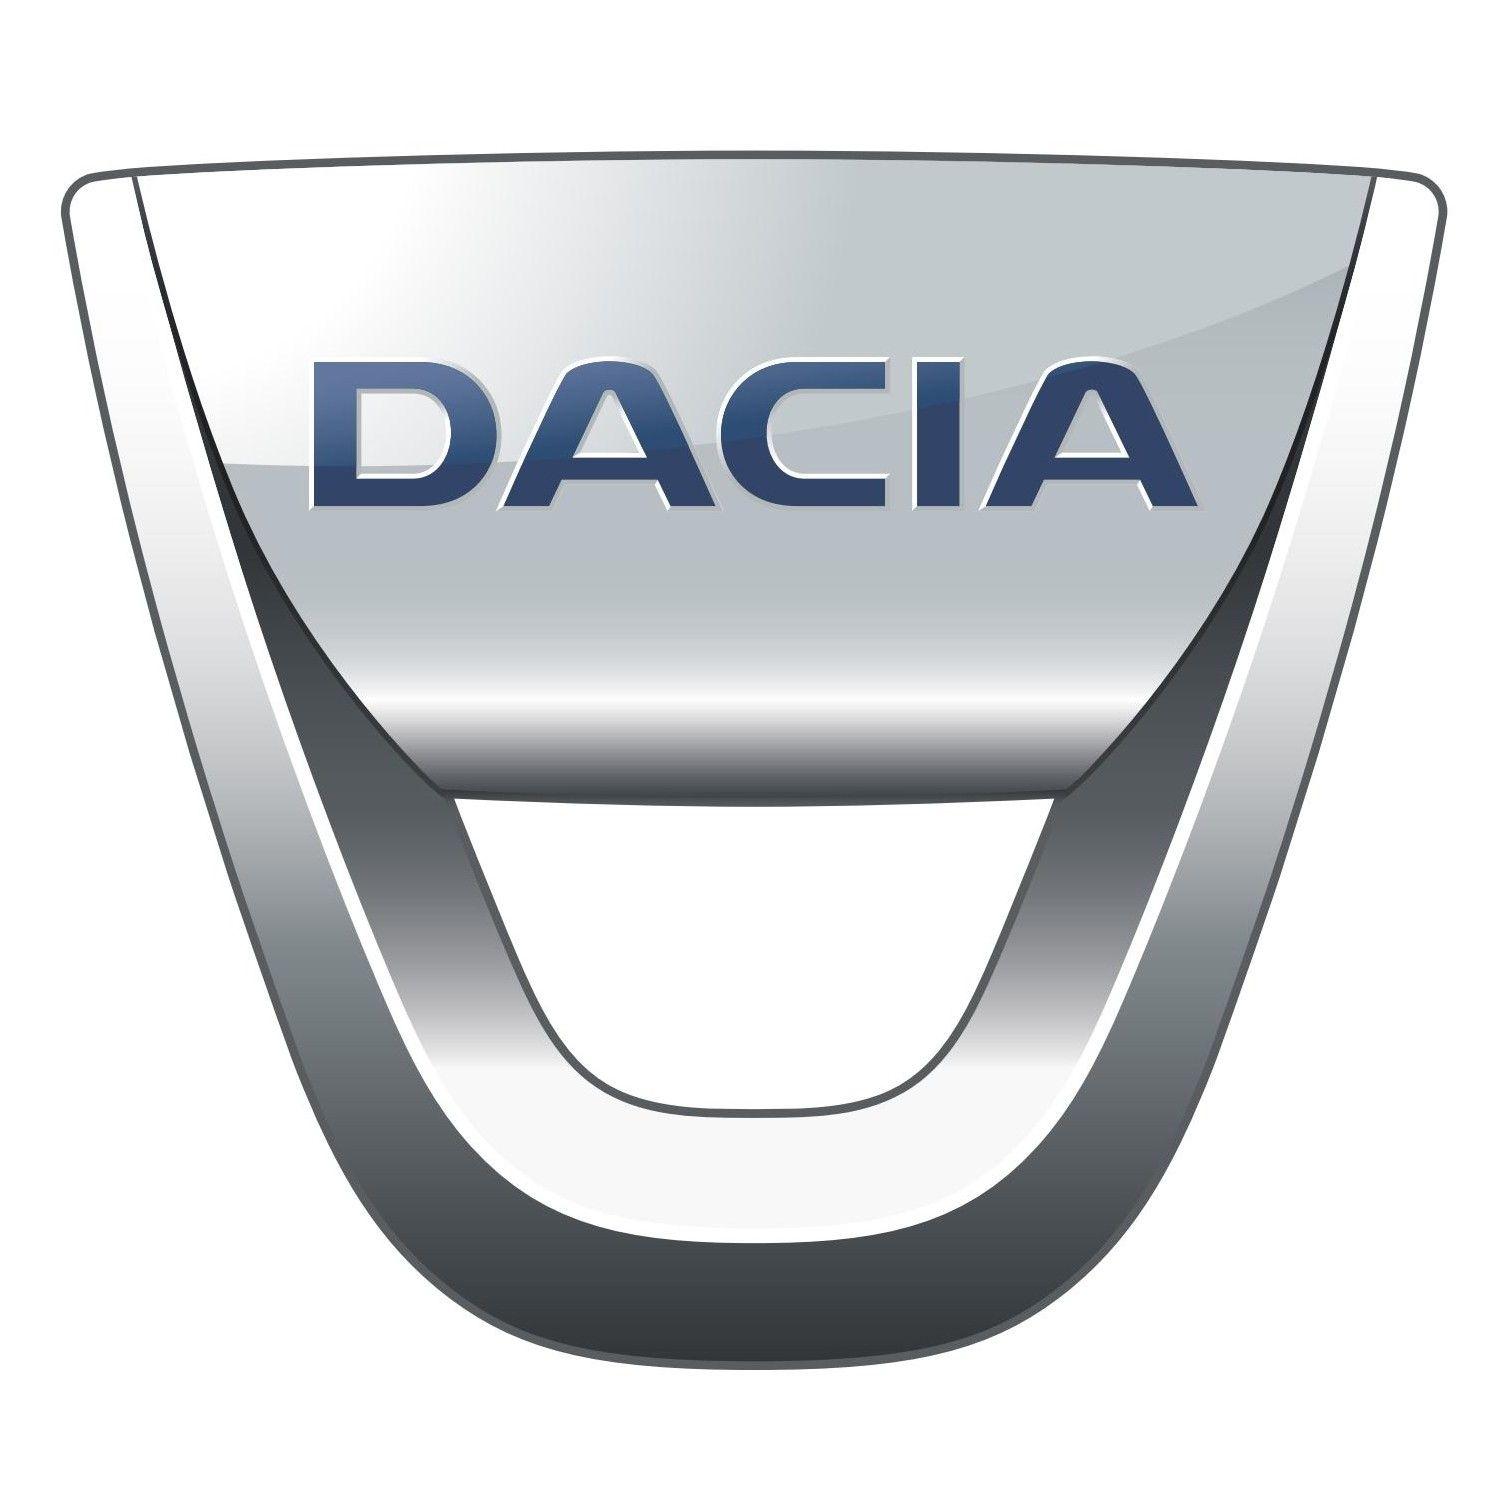 Dacia Logo Dessin Voiture Facile Logo Voitures Assurance Auto